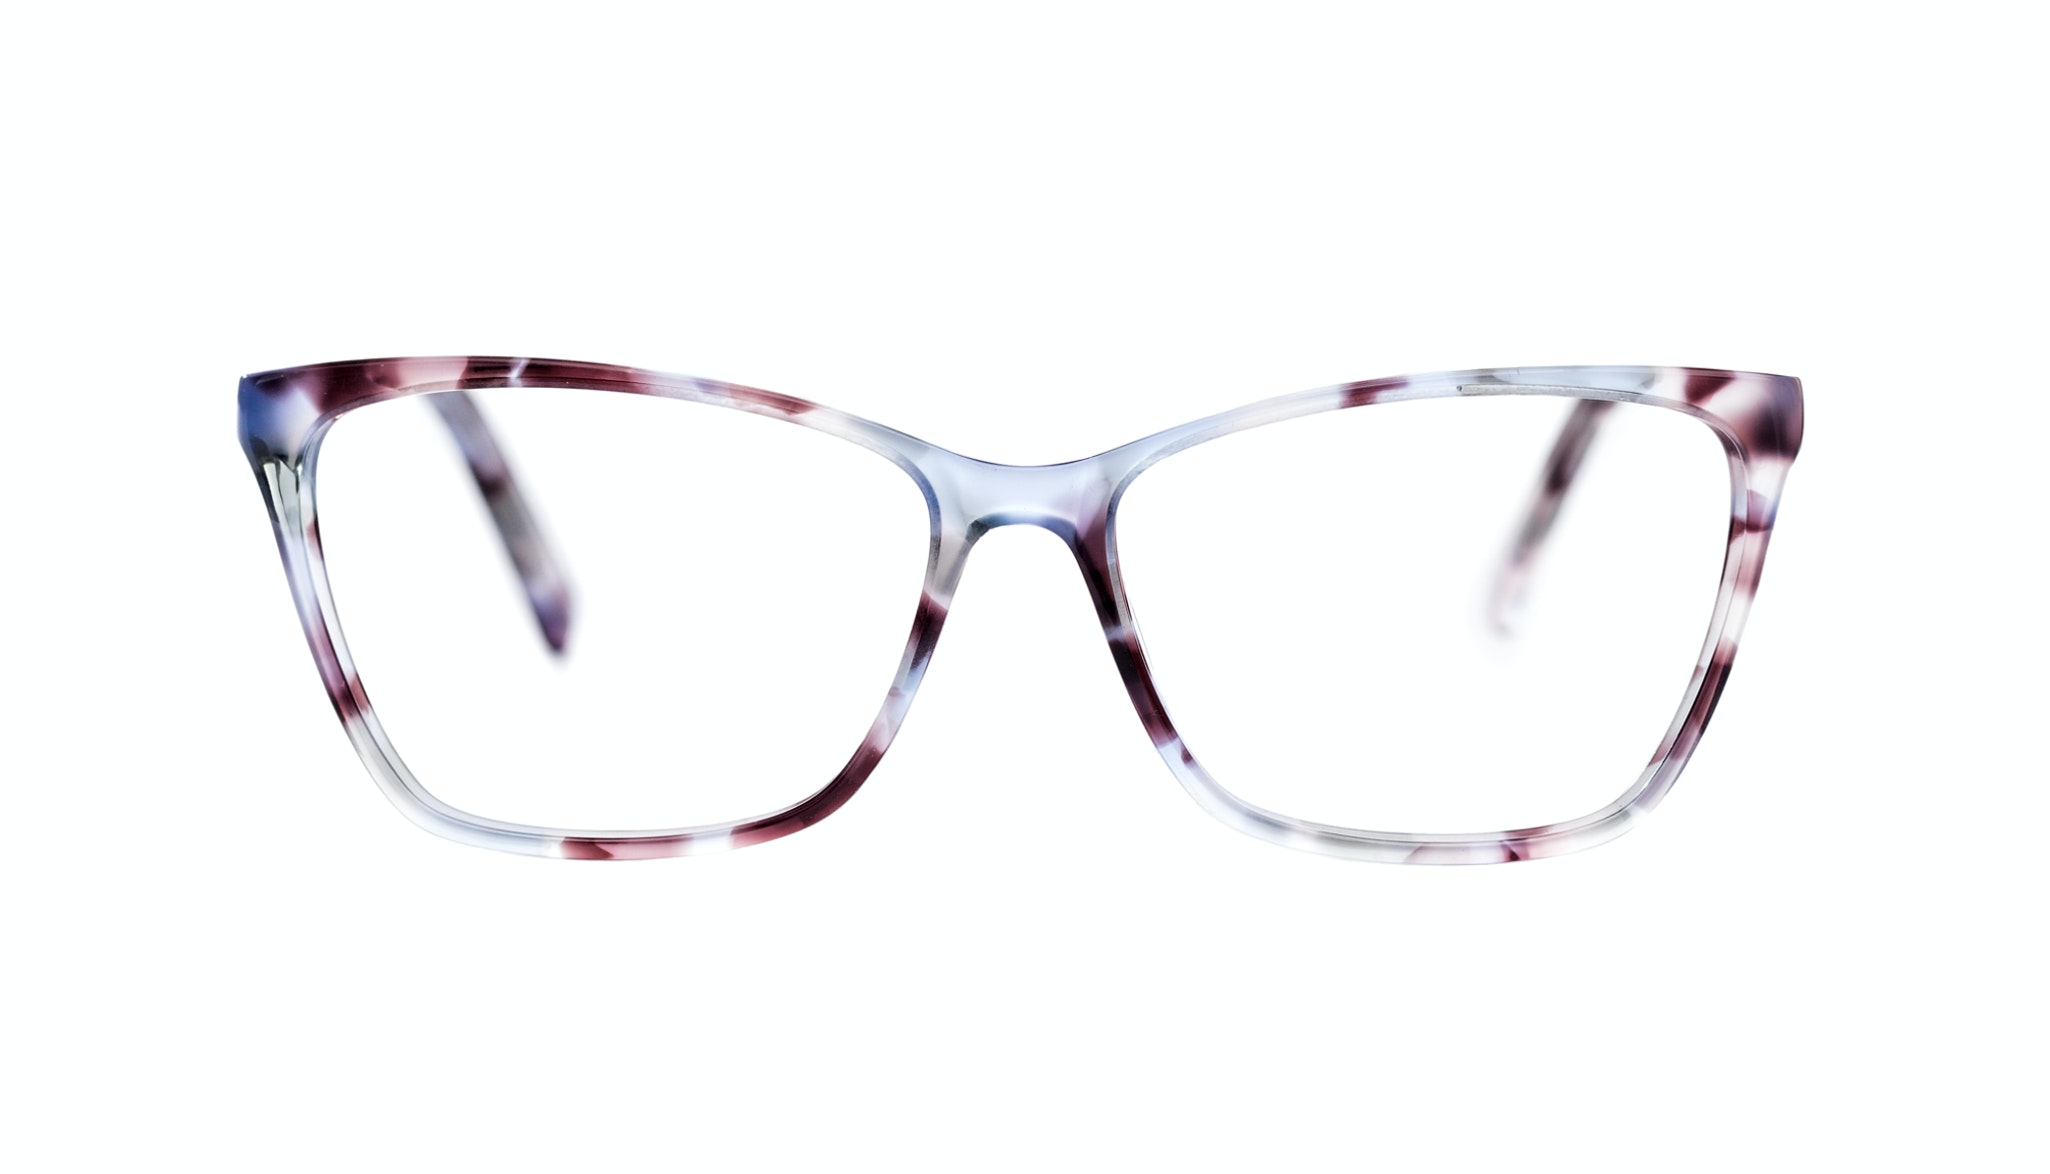 Affordable Fashion Glasses Cat Eye Rectangle Eyeglasses Women Happy Lilac Tort